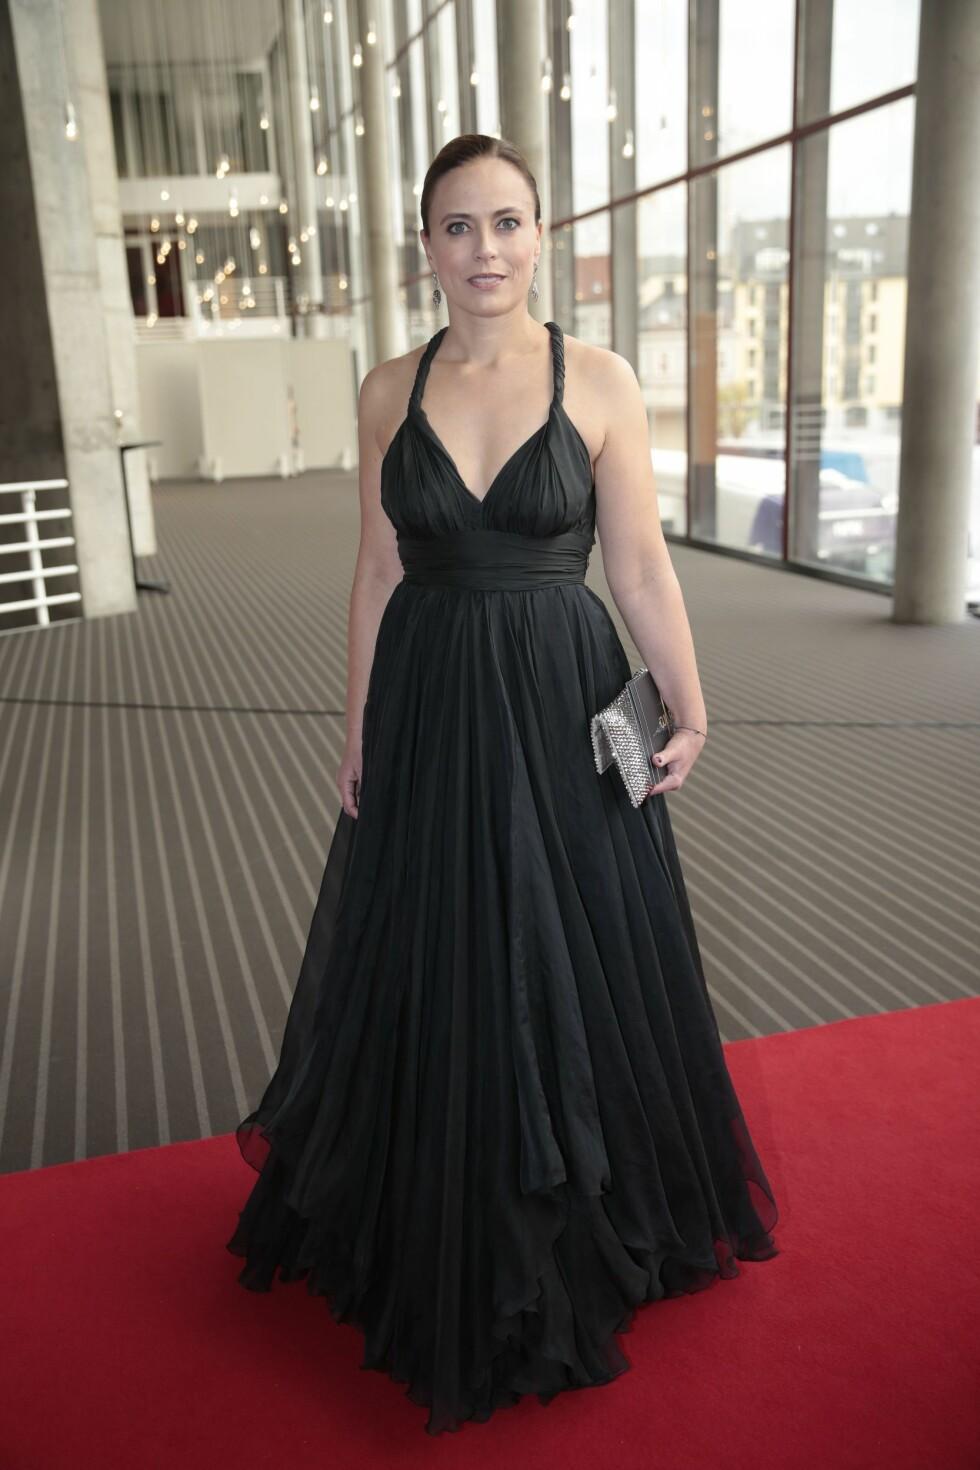 <strong>GULLRUTEN 2016:</strong> Ine Jansen i kjole fra Undorn. Foto: NTB scanpix